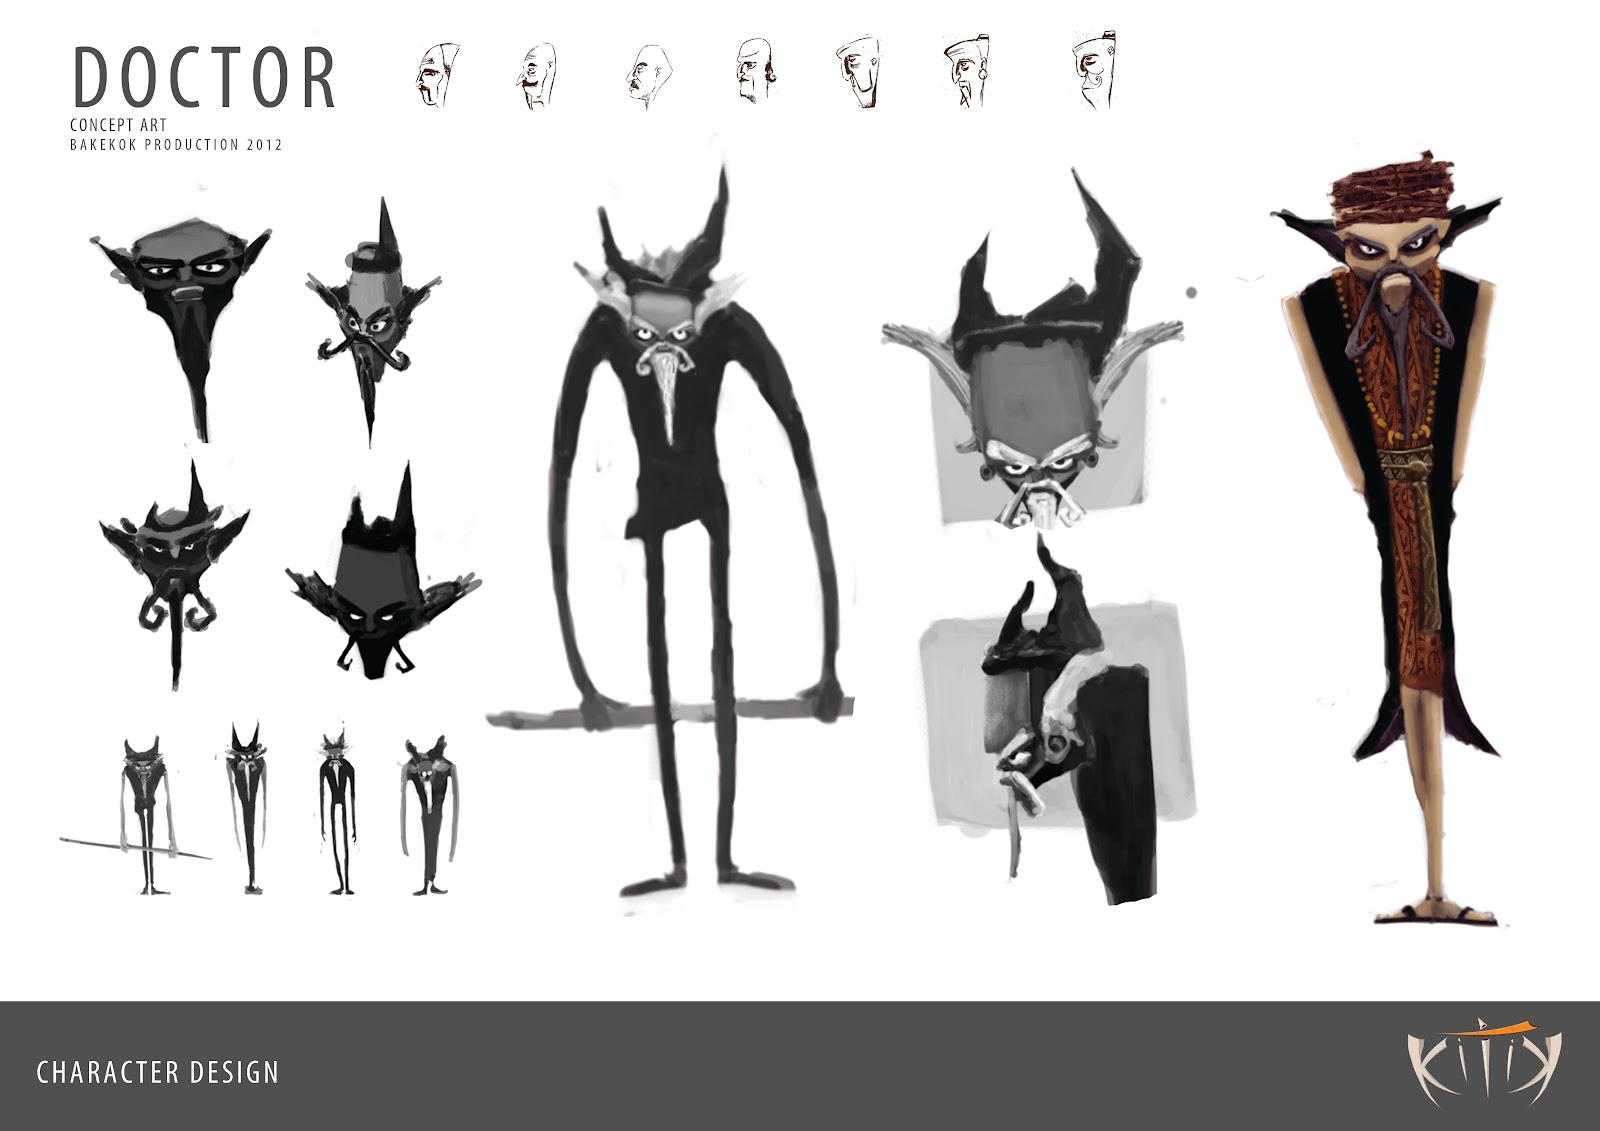 character design post - photo #32